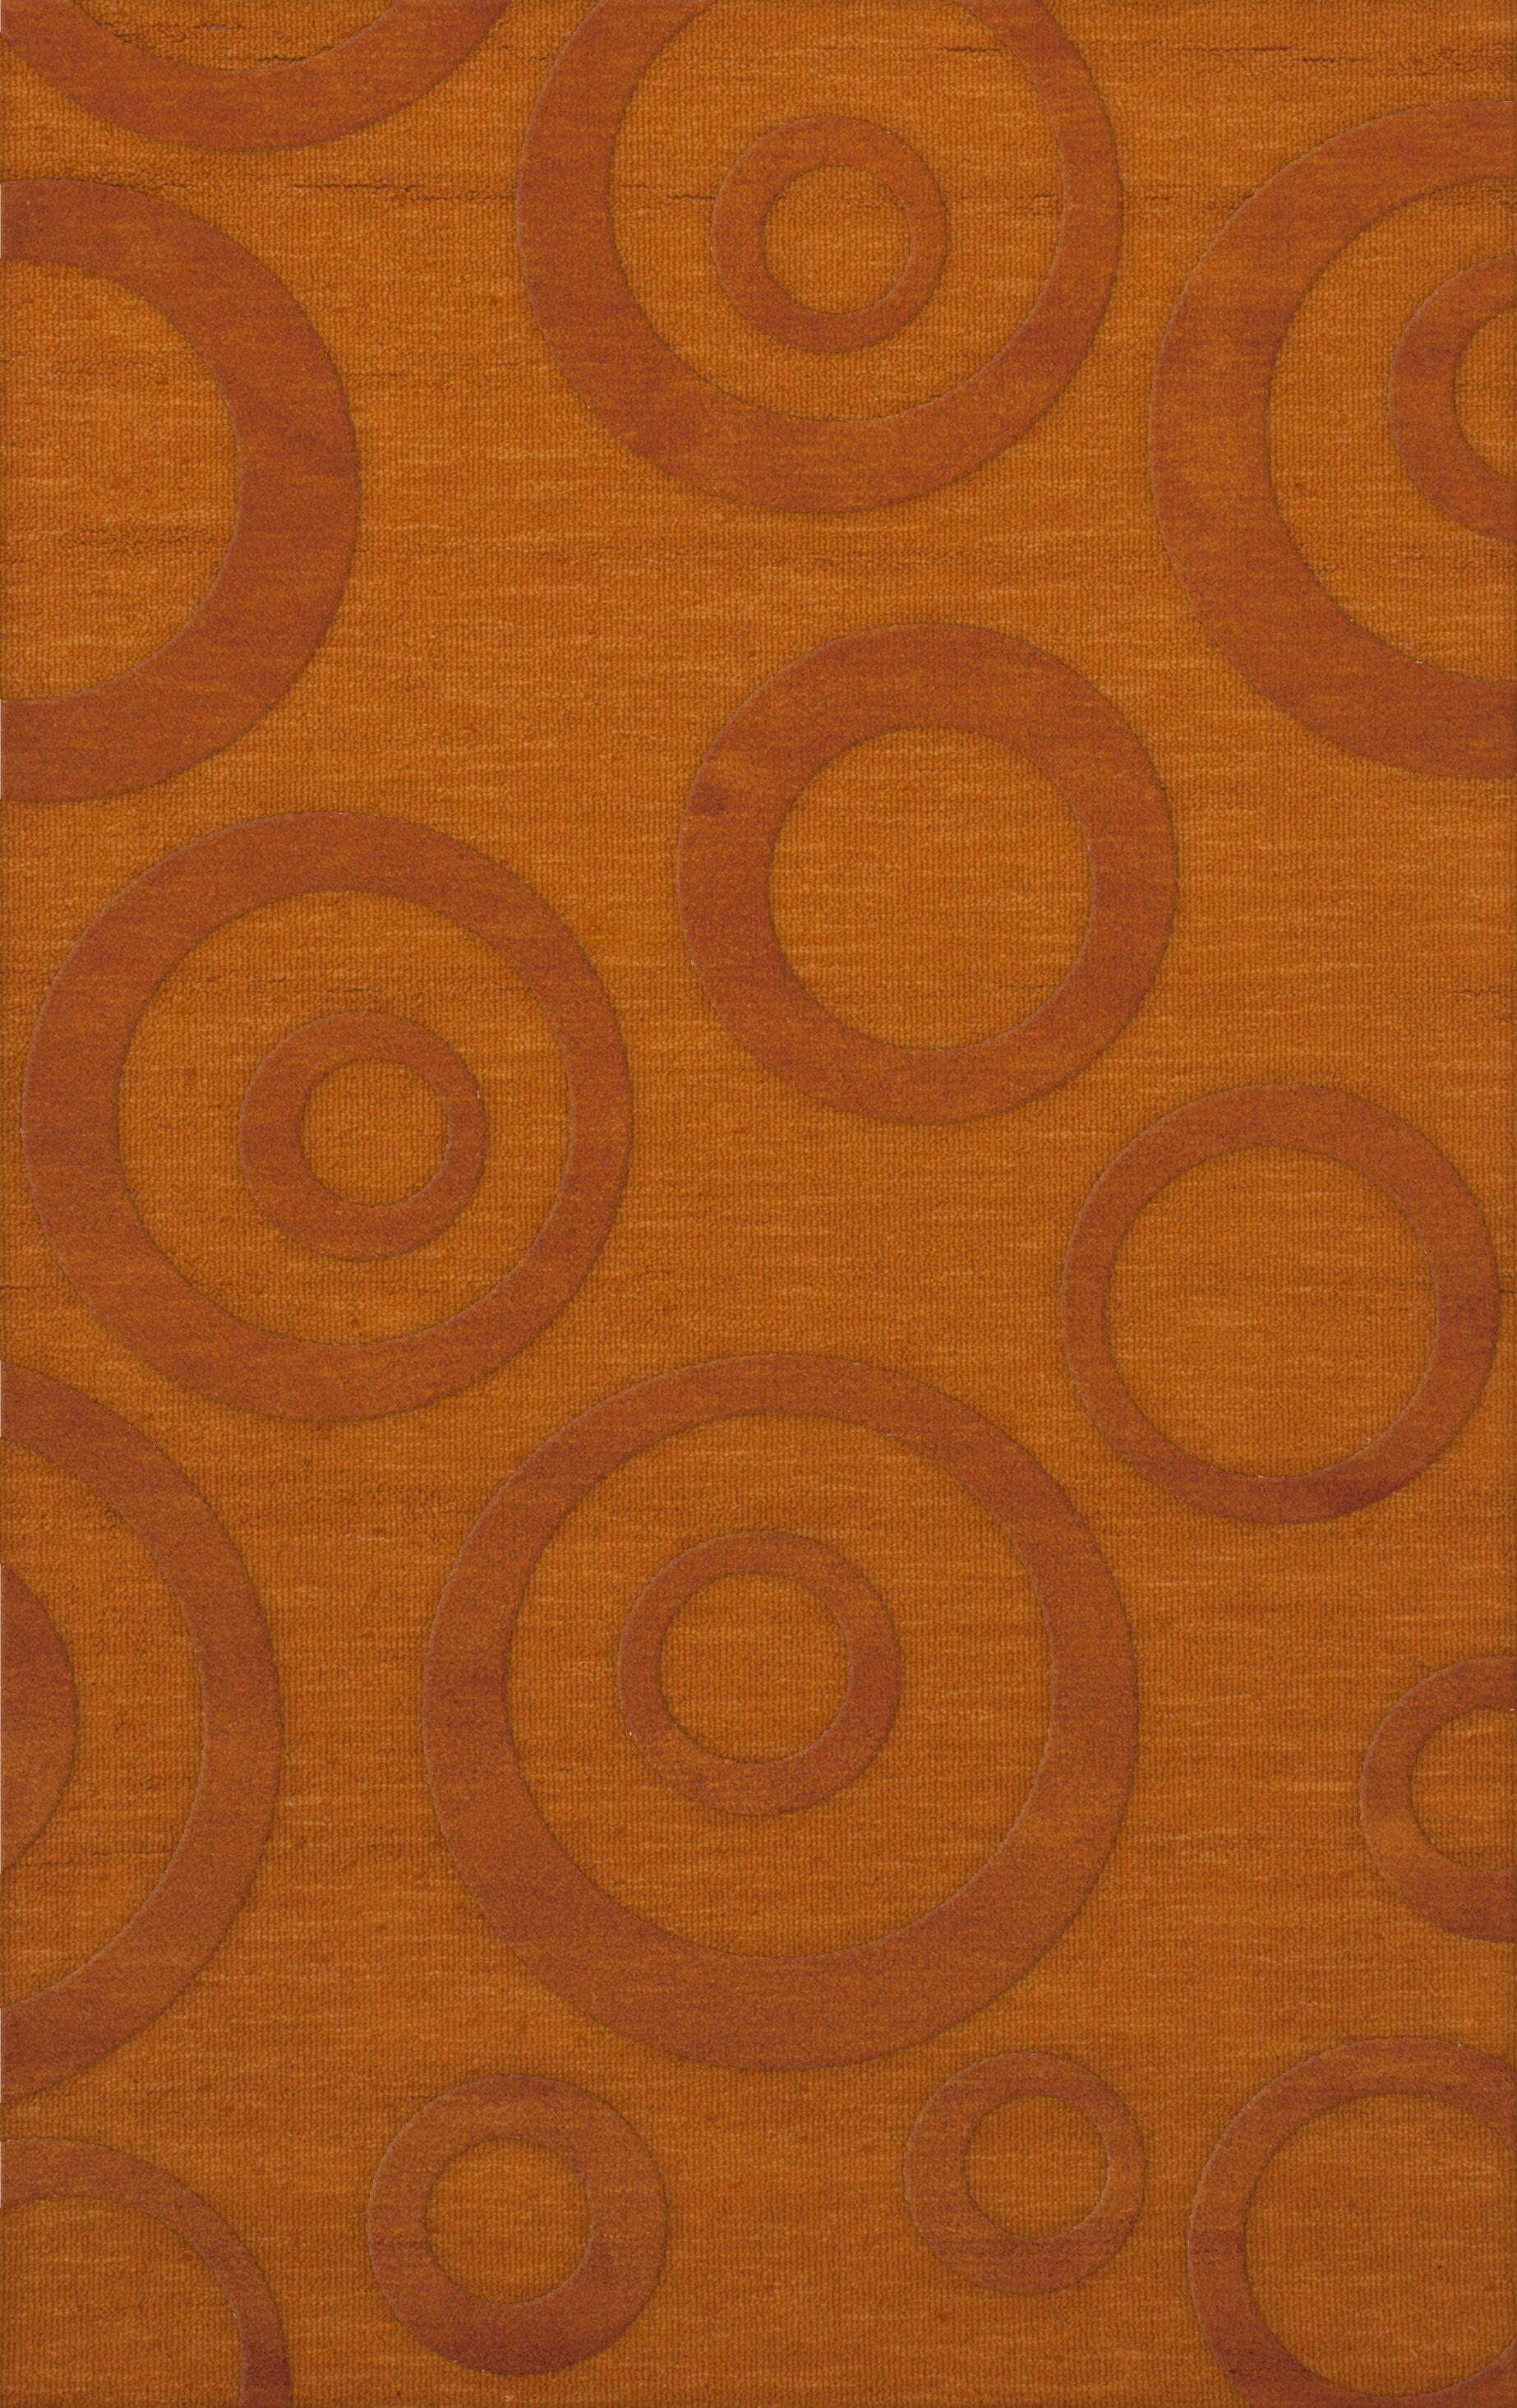 Dover Tufted Wool Orange Area Rug Rug Size: Rectangle 8' x 10'